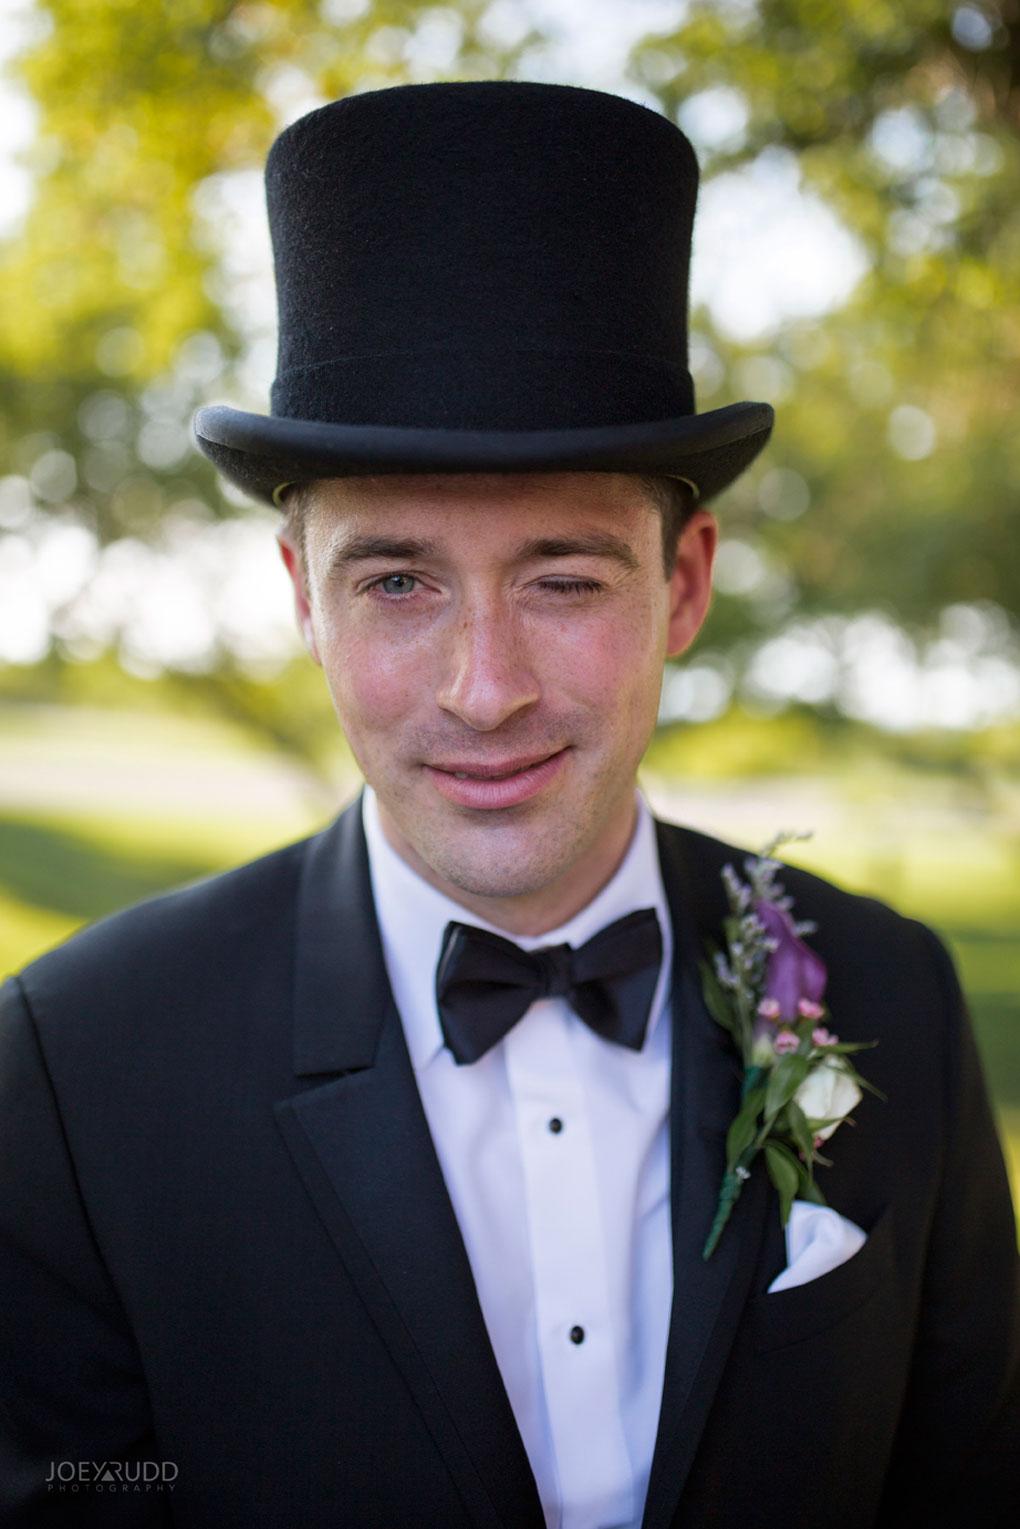 Marshes Wedding, Marshes Golf Club, Ottawa, Ottawa Wedding, Ontario Wedding, Joey Rudd Photography, Wedding Photos, Ceremony, Groom